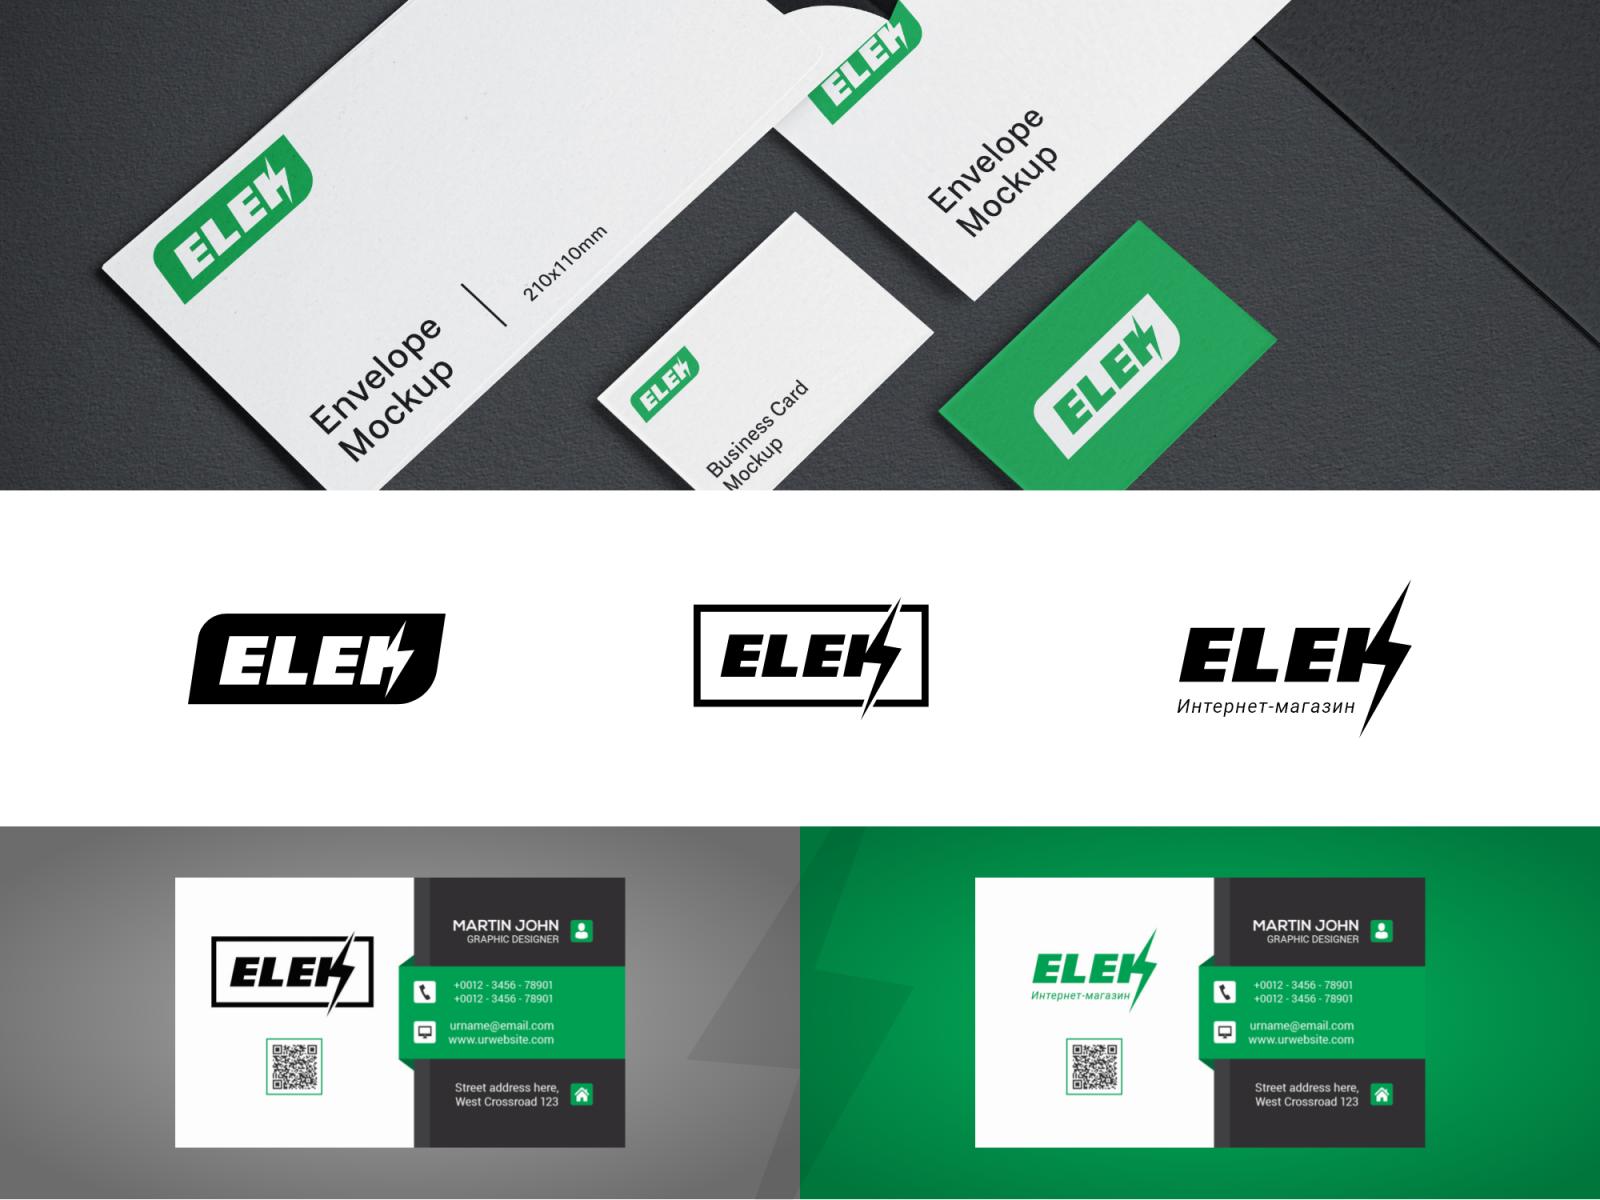 Elek Logo By Pyatnica On Dribbble